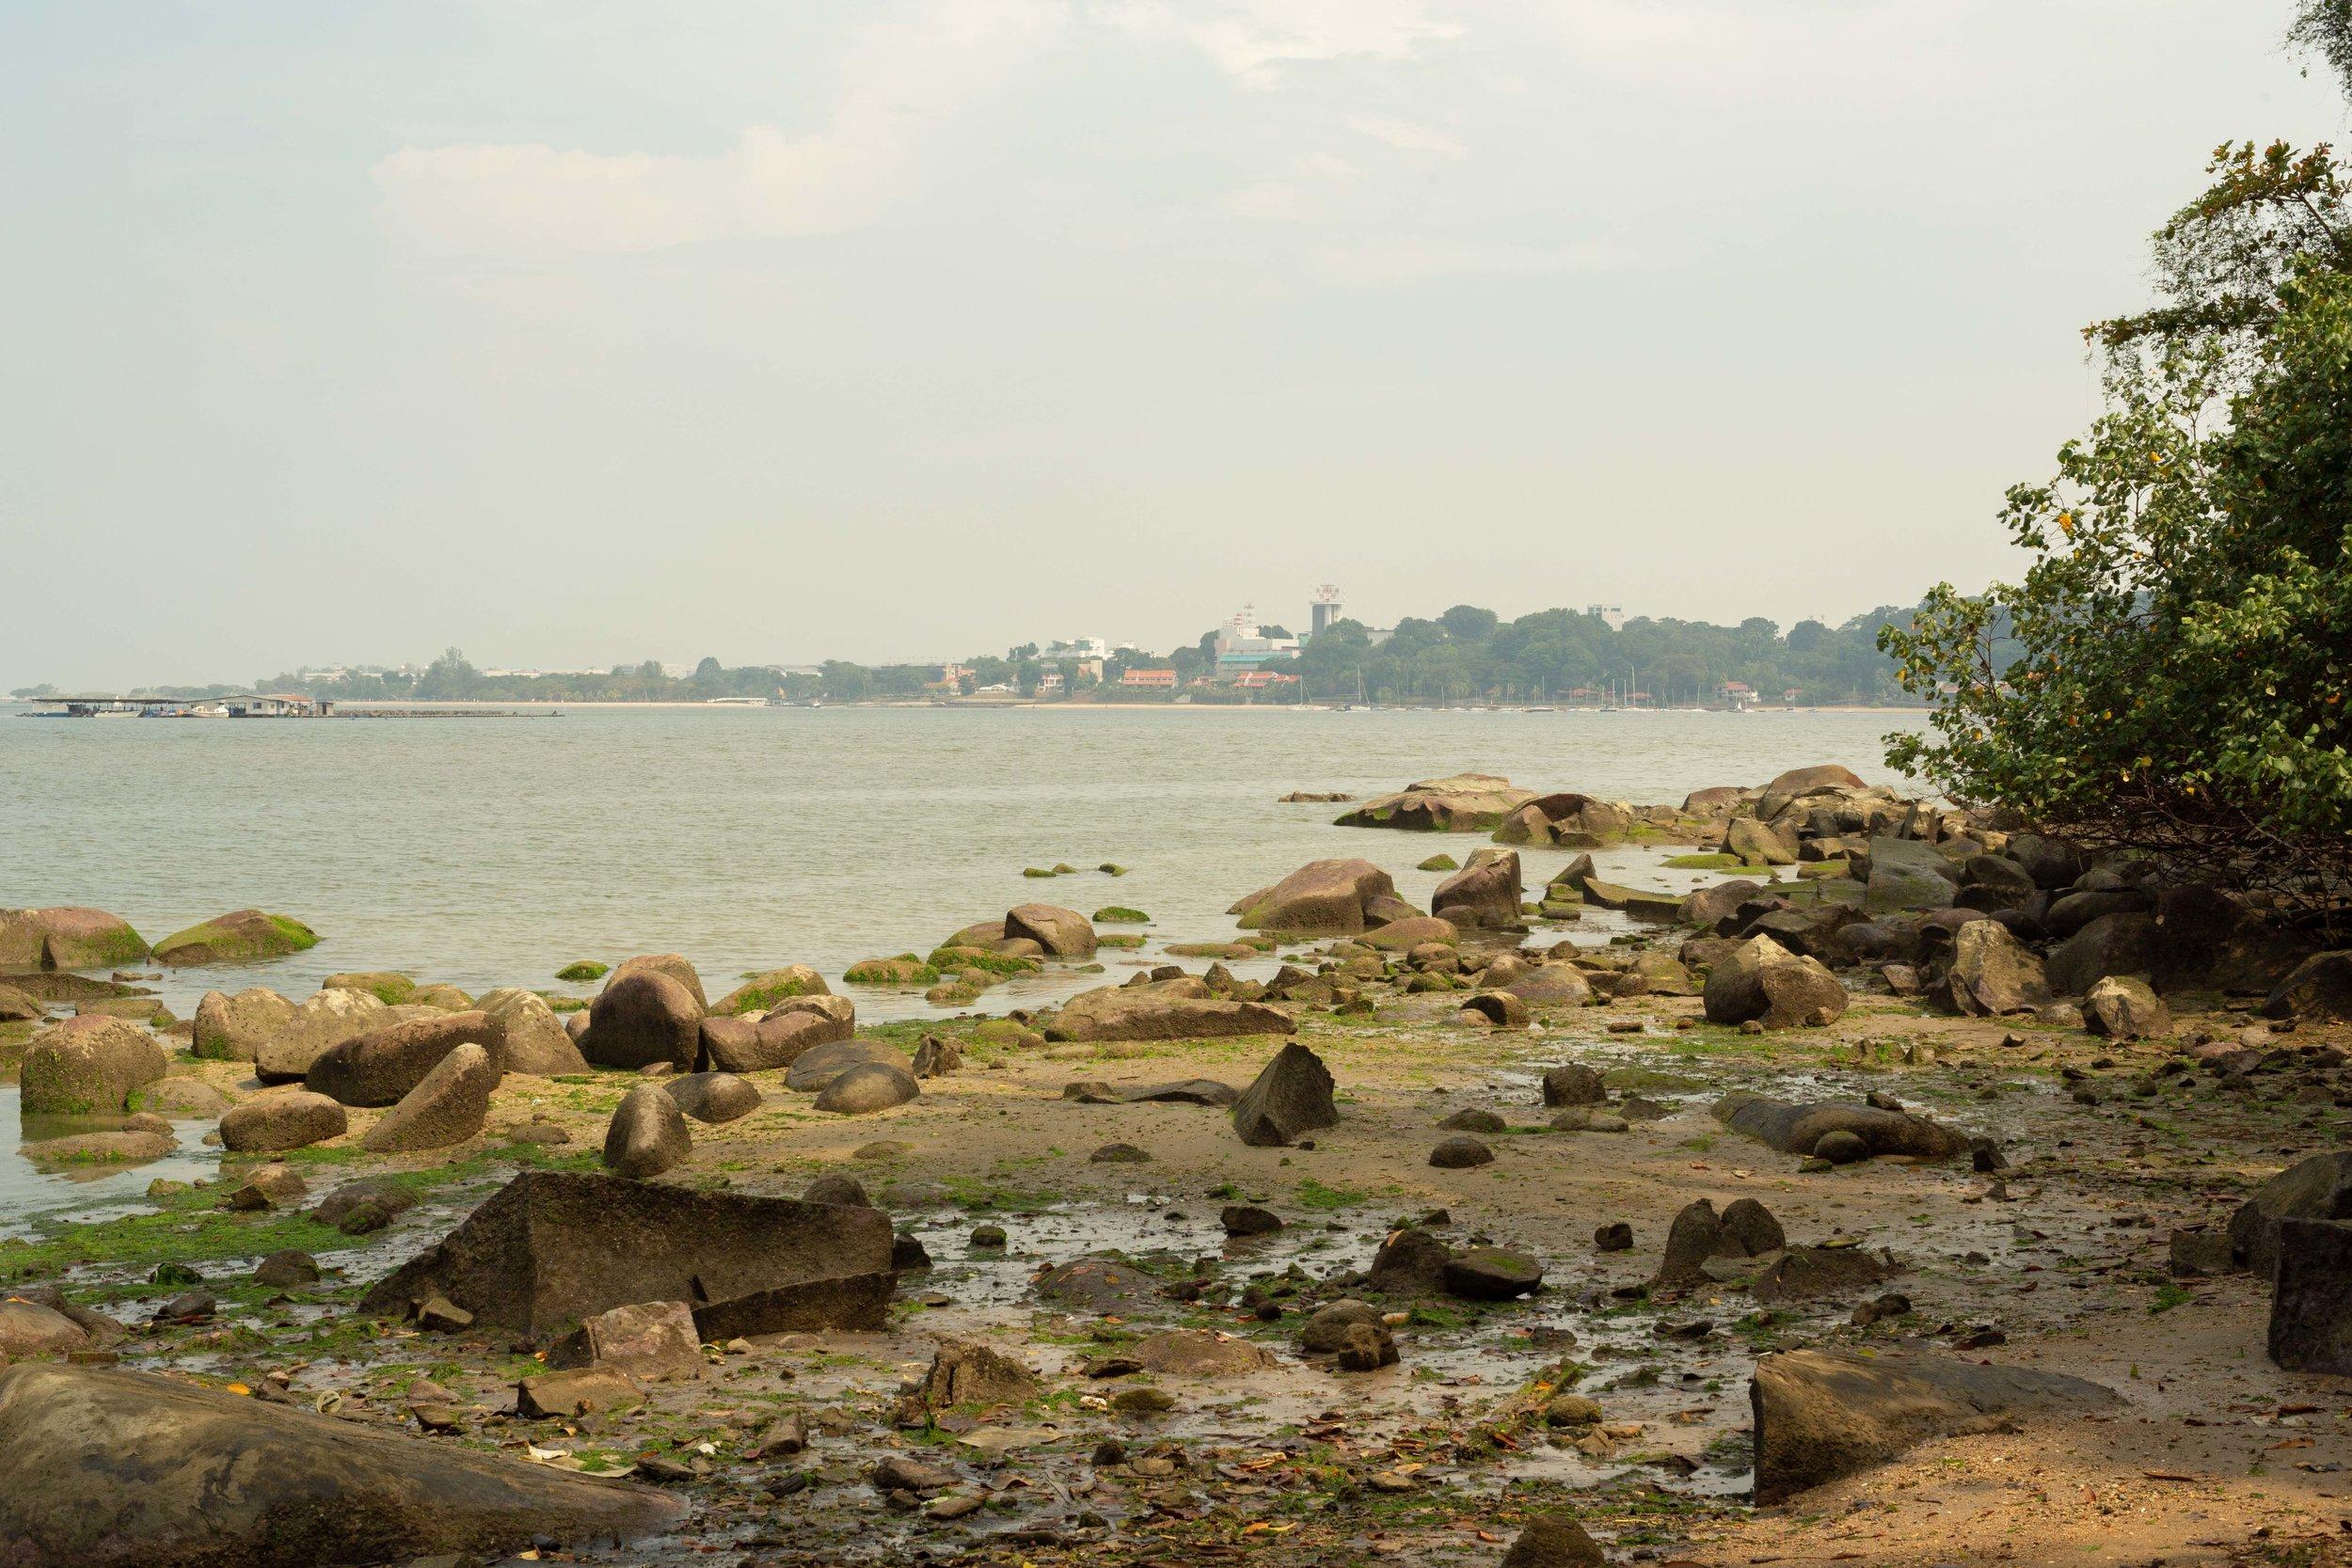 View from the shore near Kampong Sungei Durian toward mainland Singapore